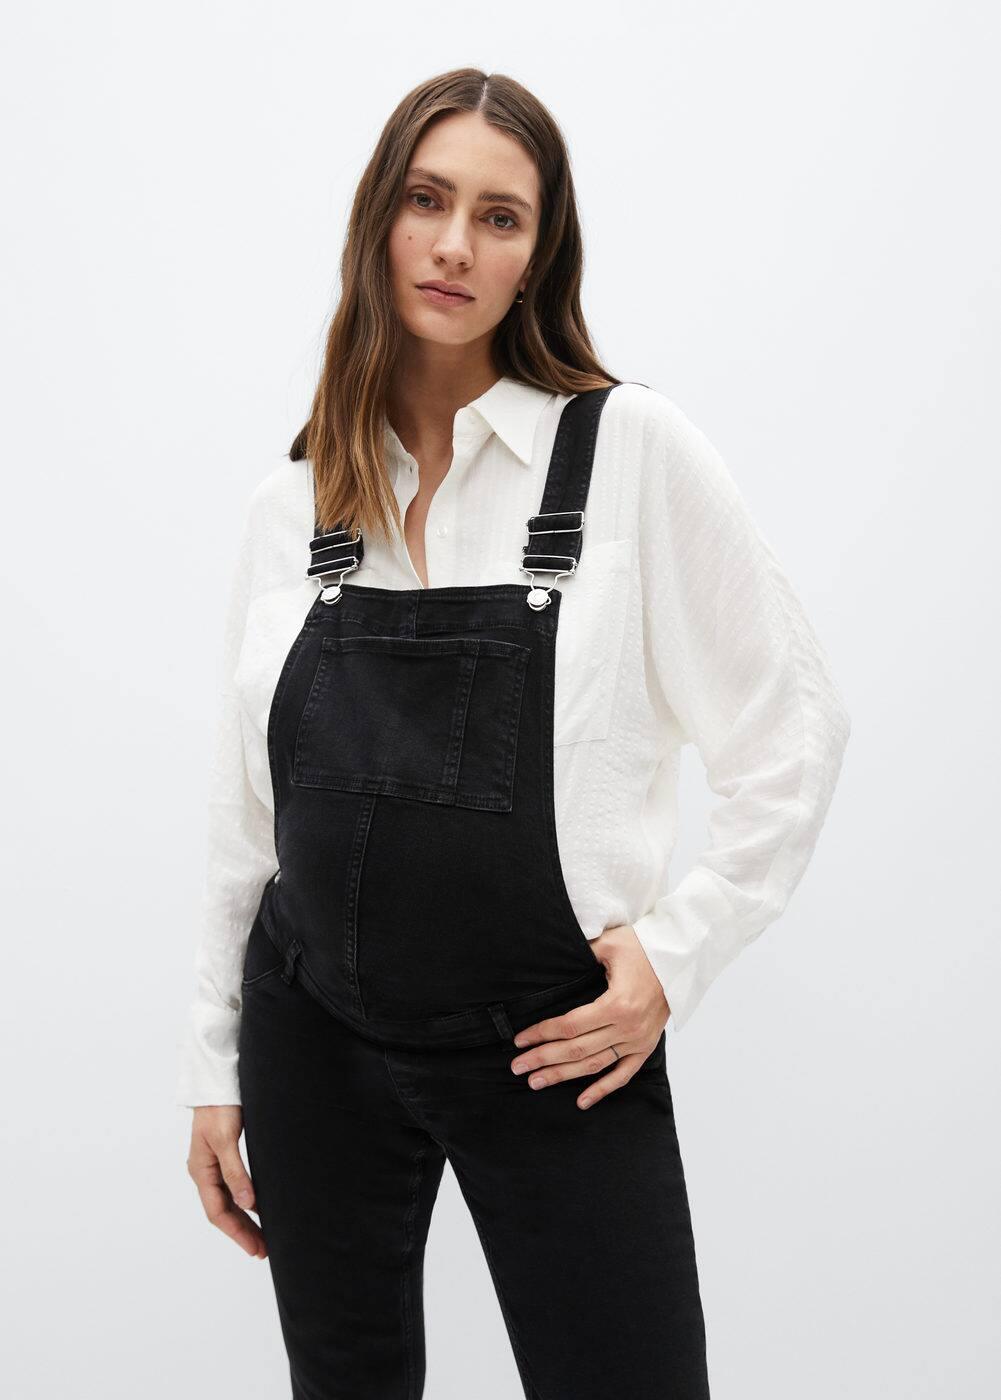 Stylische Schwangerschaftslatzhose  Maternity Jeans-Latzhose